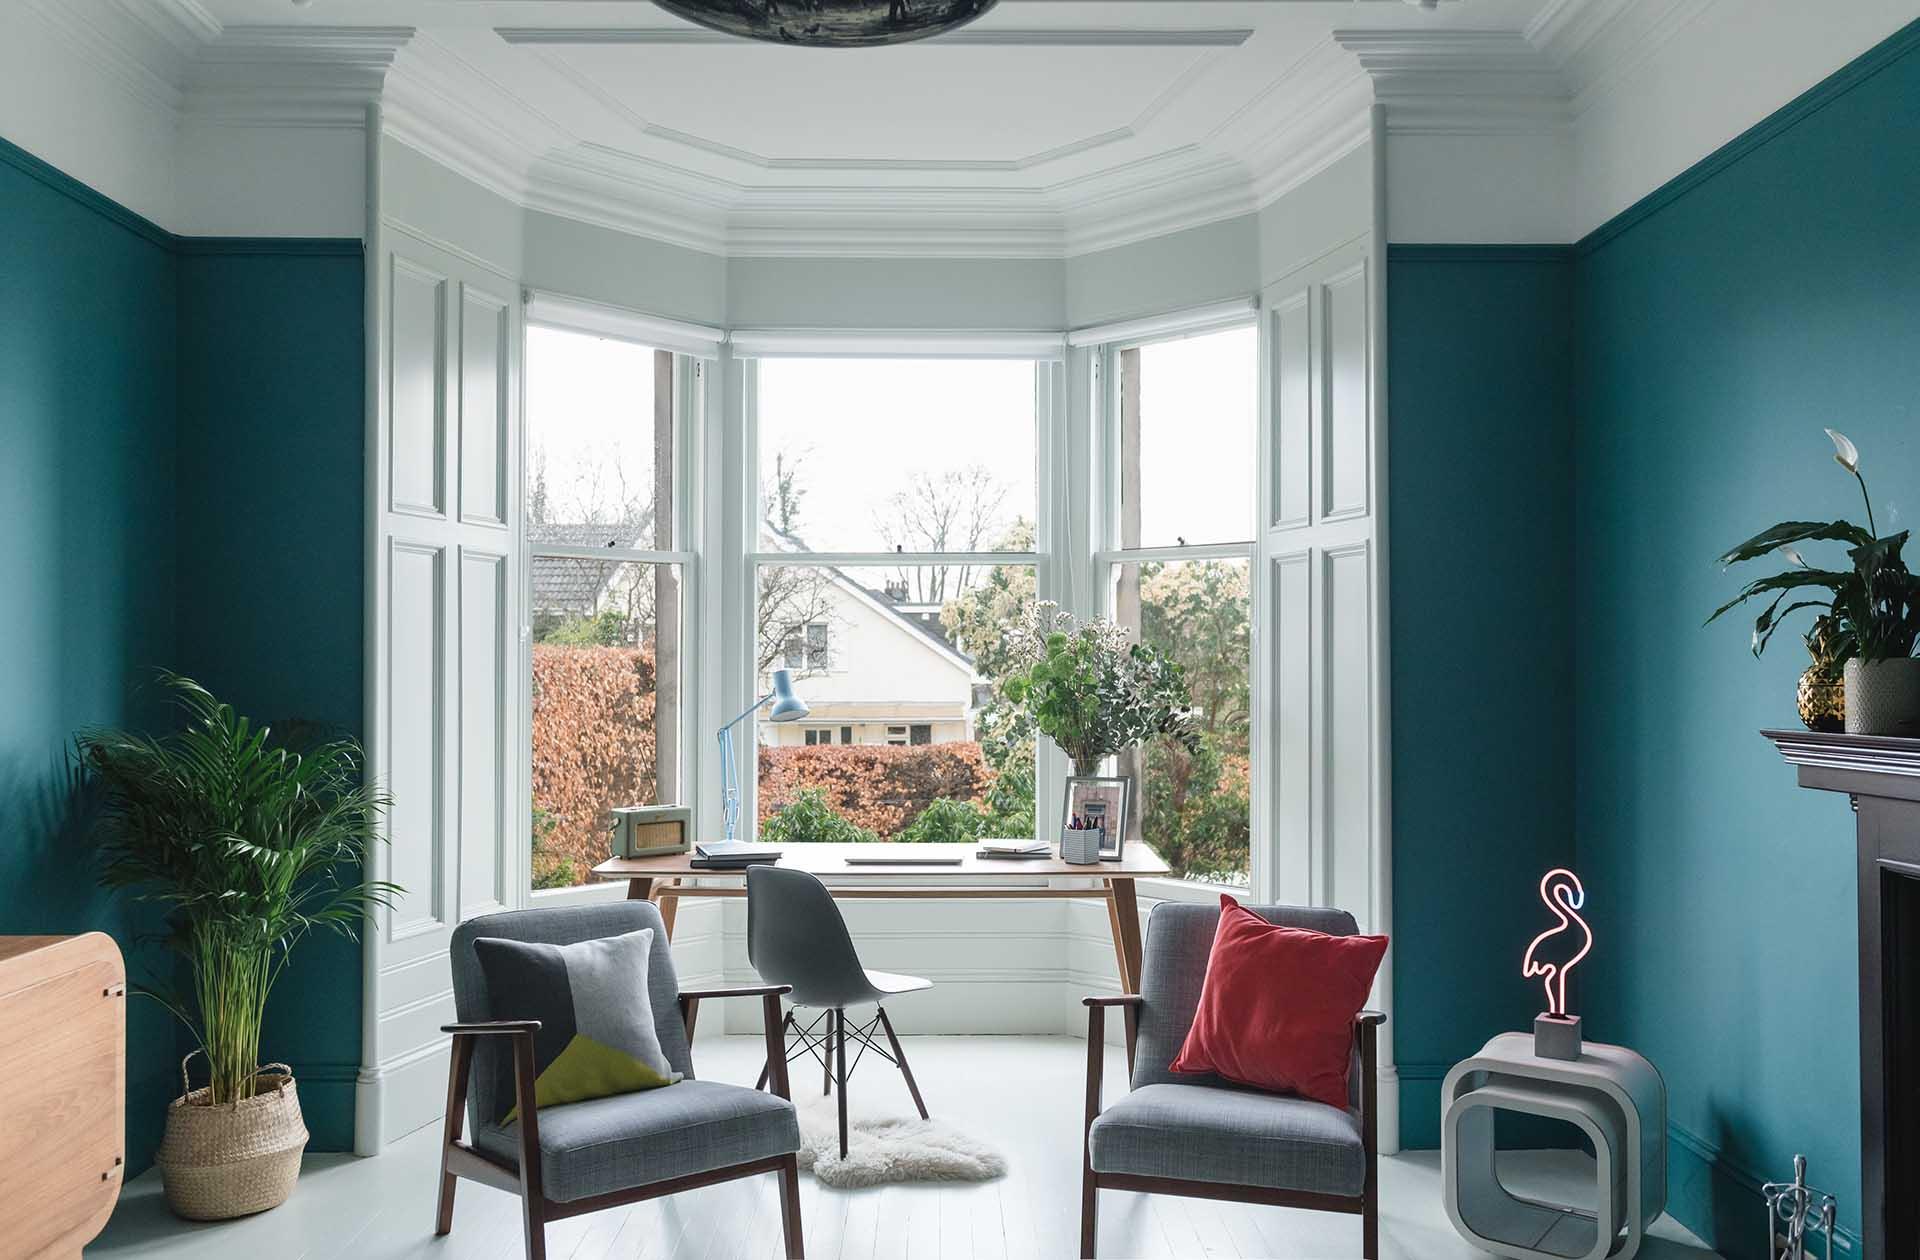 SJS Architect-Interior-Lounge 1